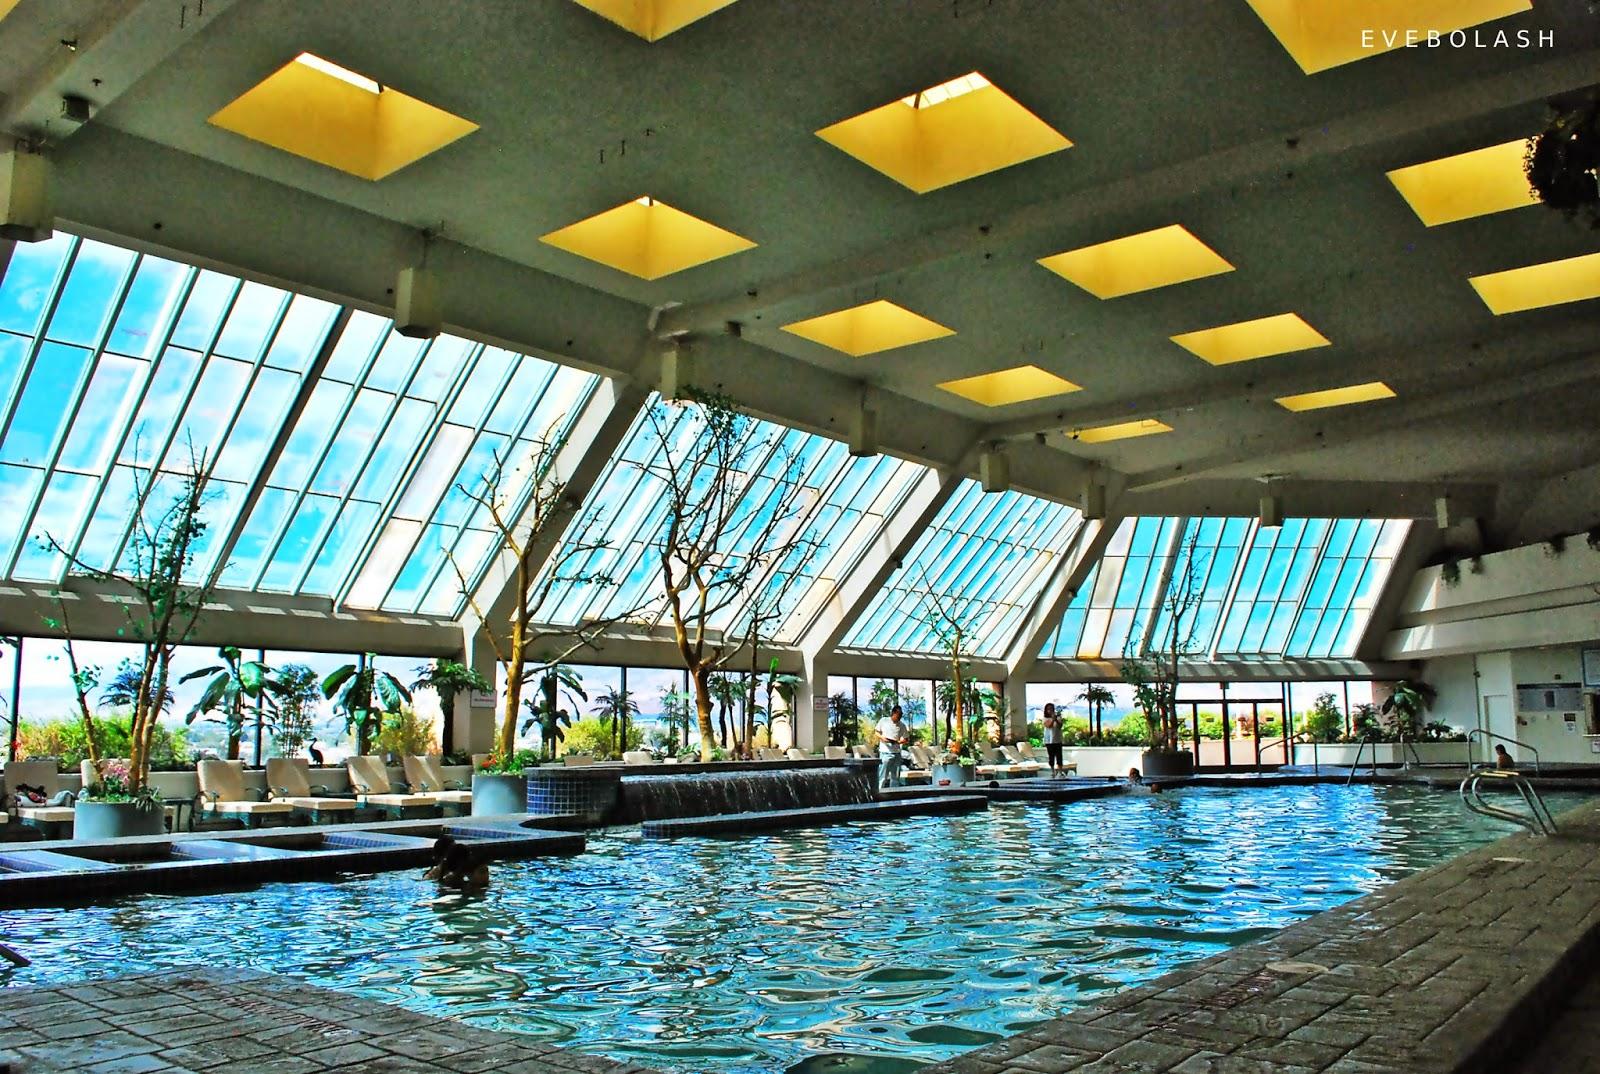 Happiness john ascuaga 39 s nugget casino resort - Reno hotels with indoor swimming pool ...